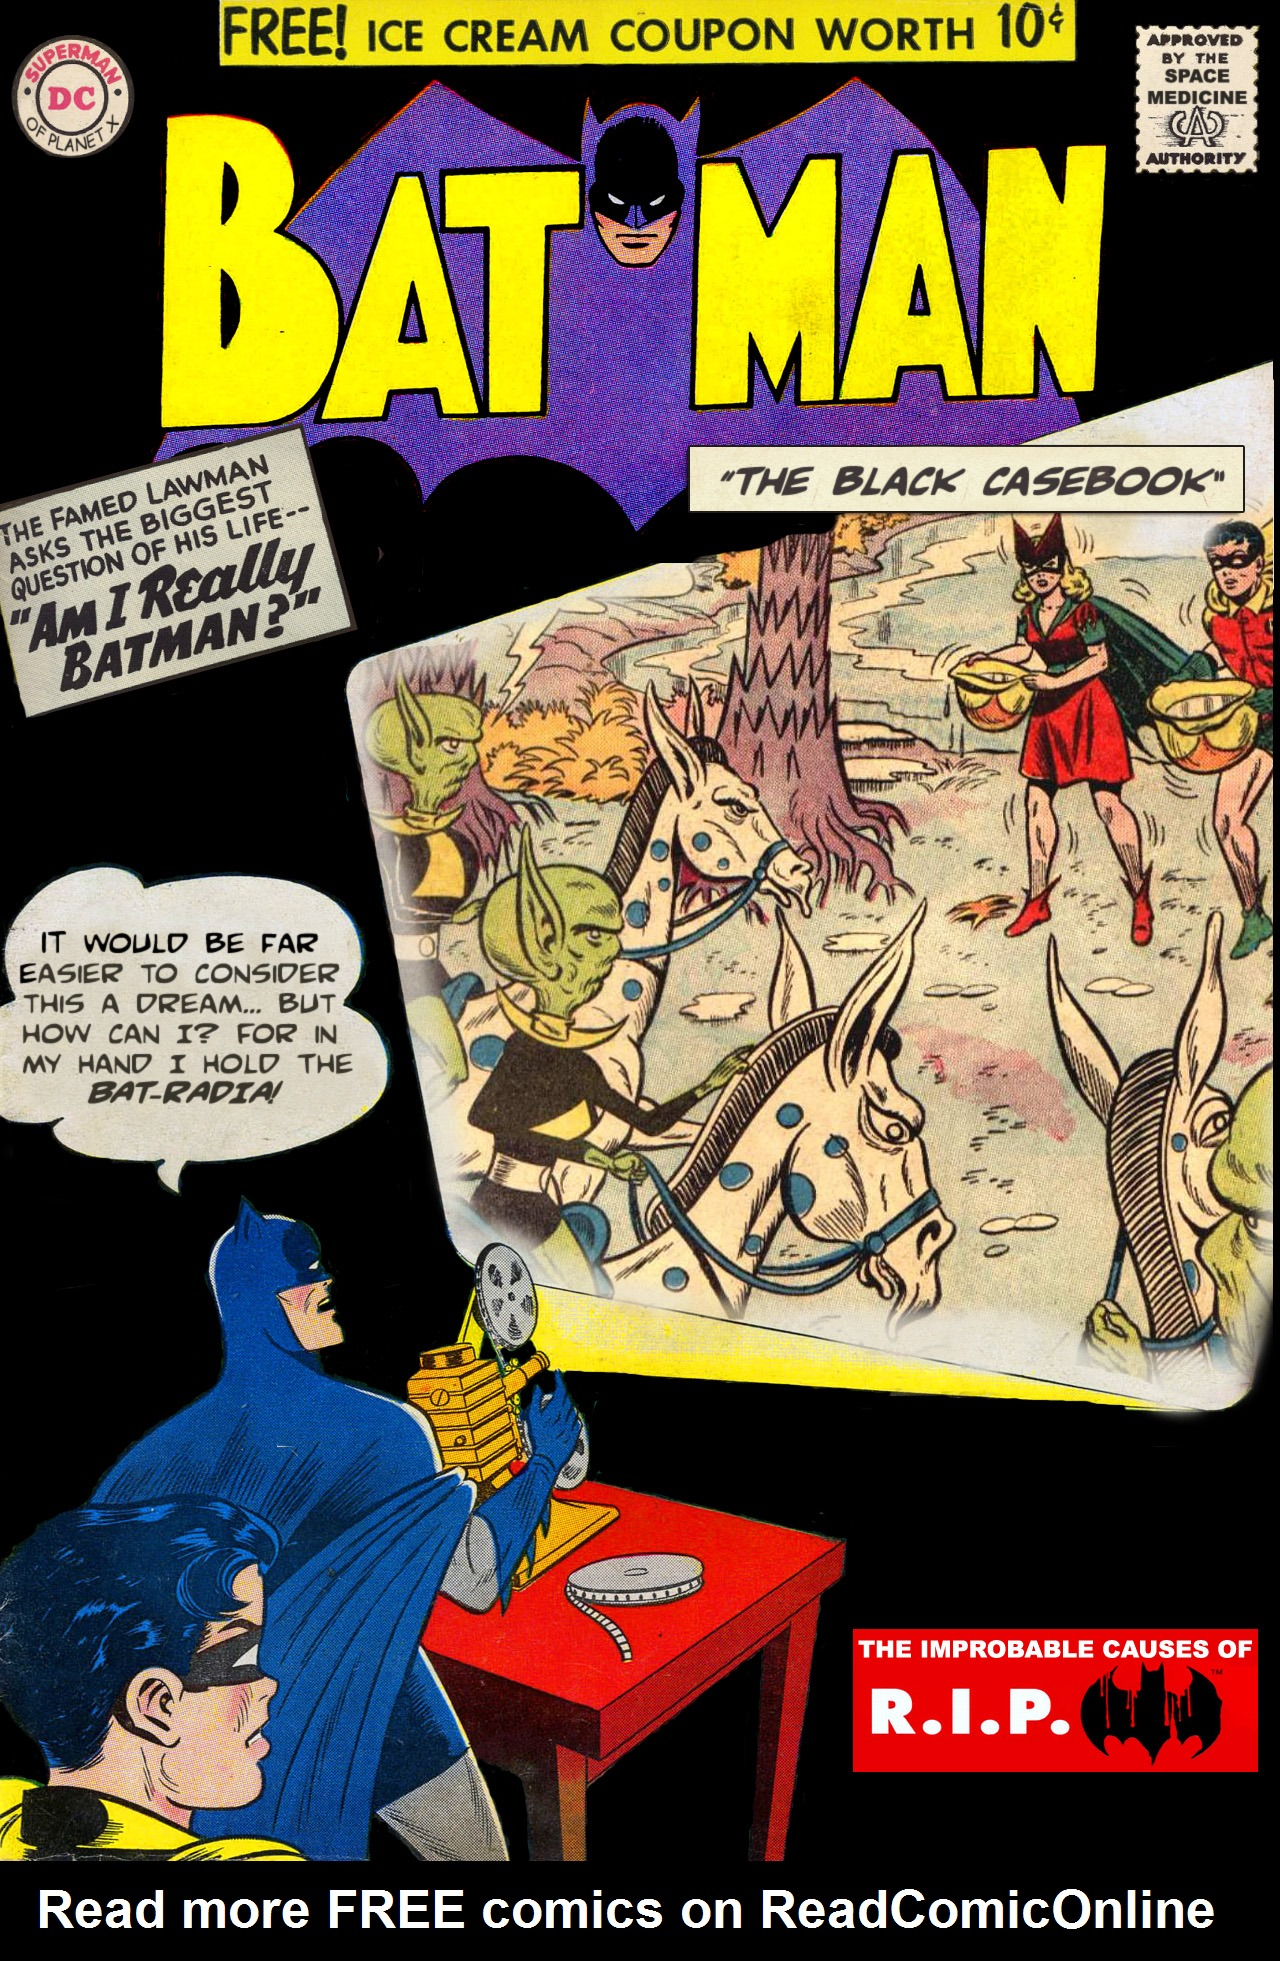 Read online Batman: The Black Casebook comic -  Issue # TPB - 2